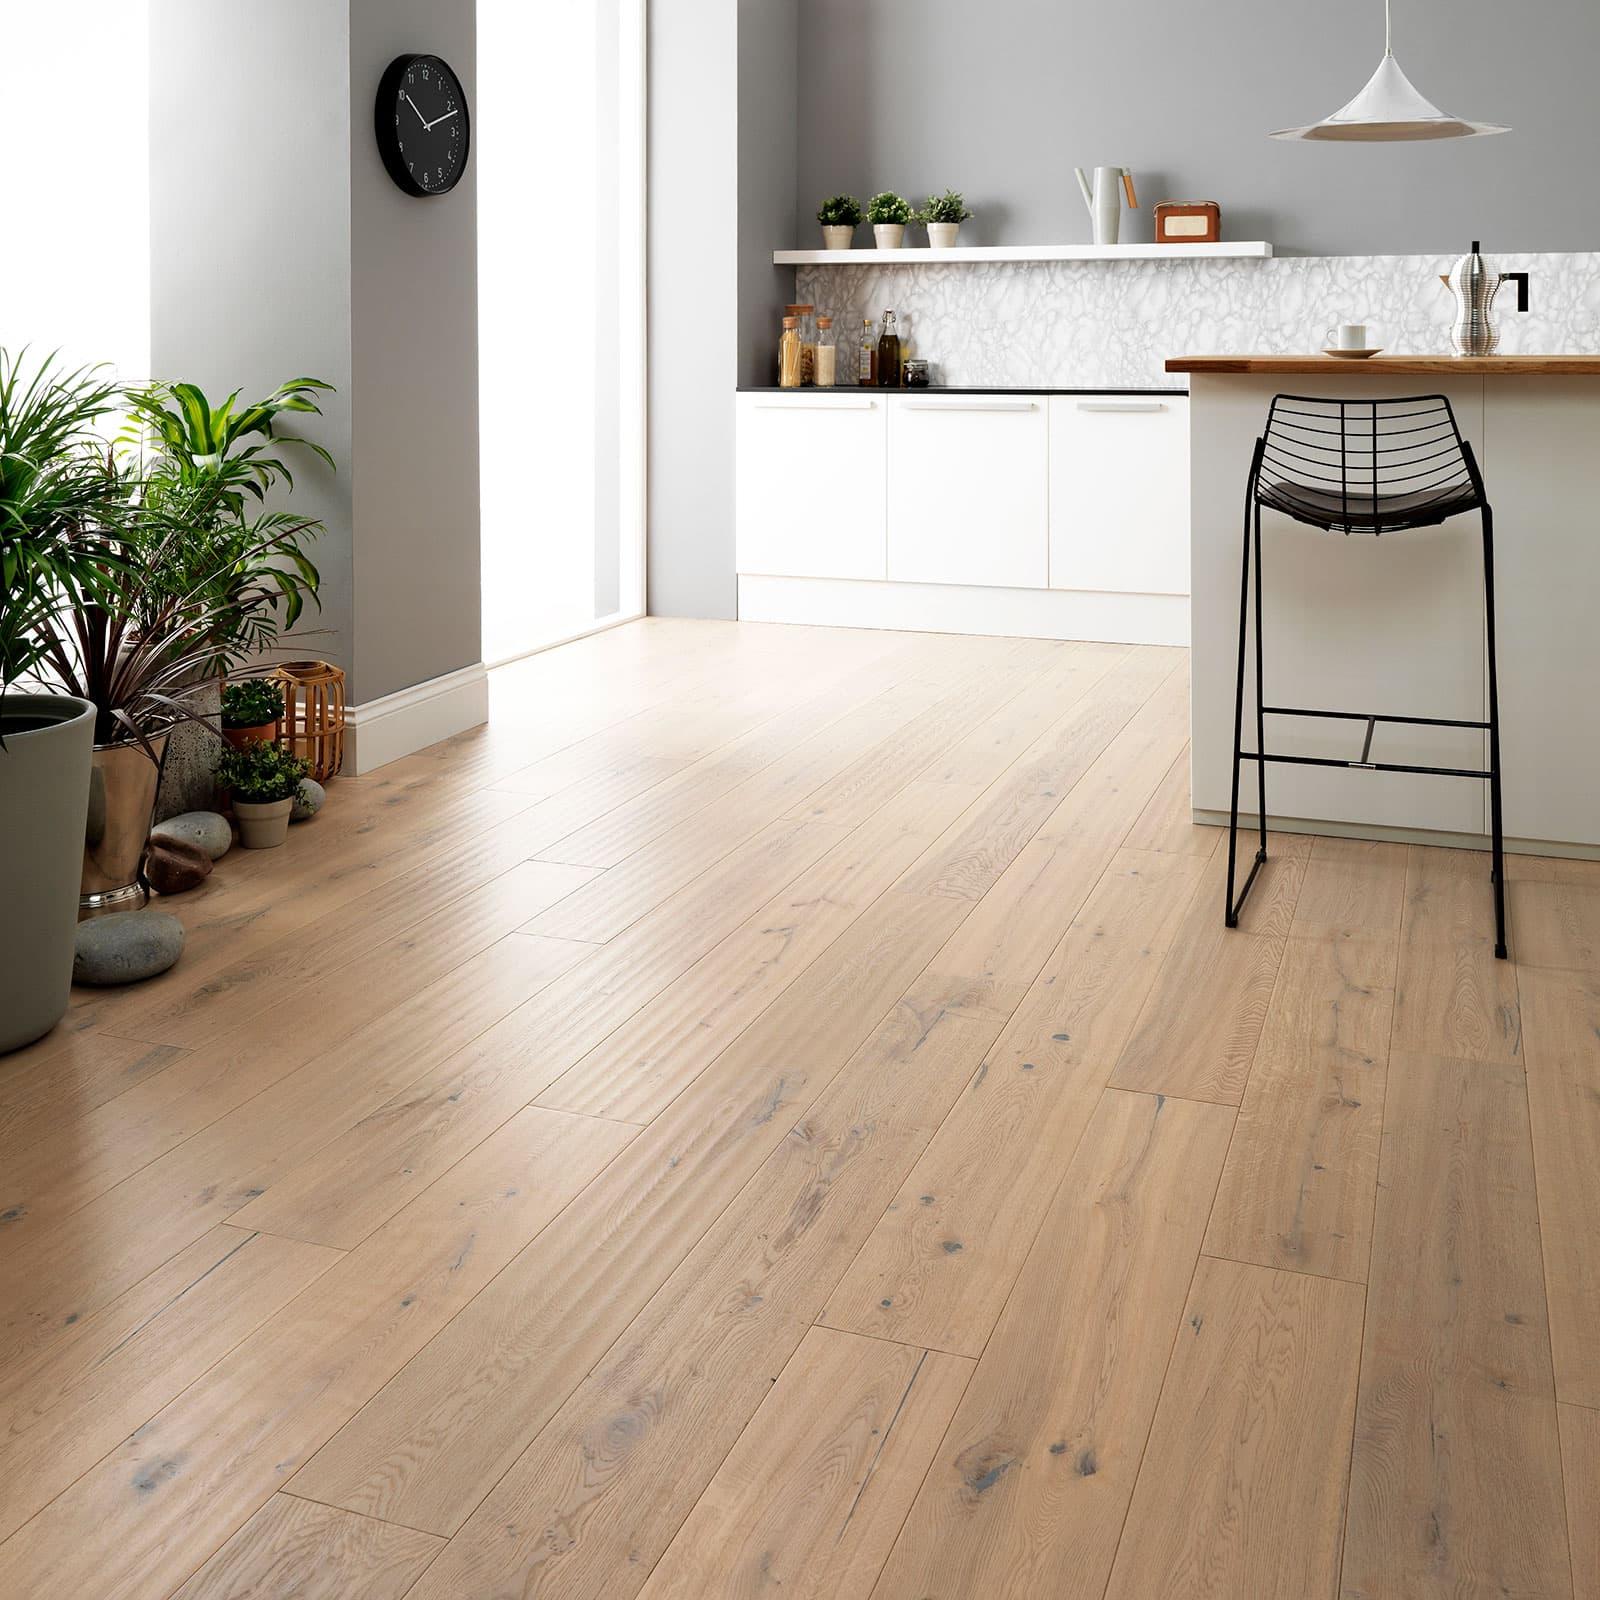 Berkeley Cottage Oak Flooring: Best Carpets And Wood In London